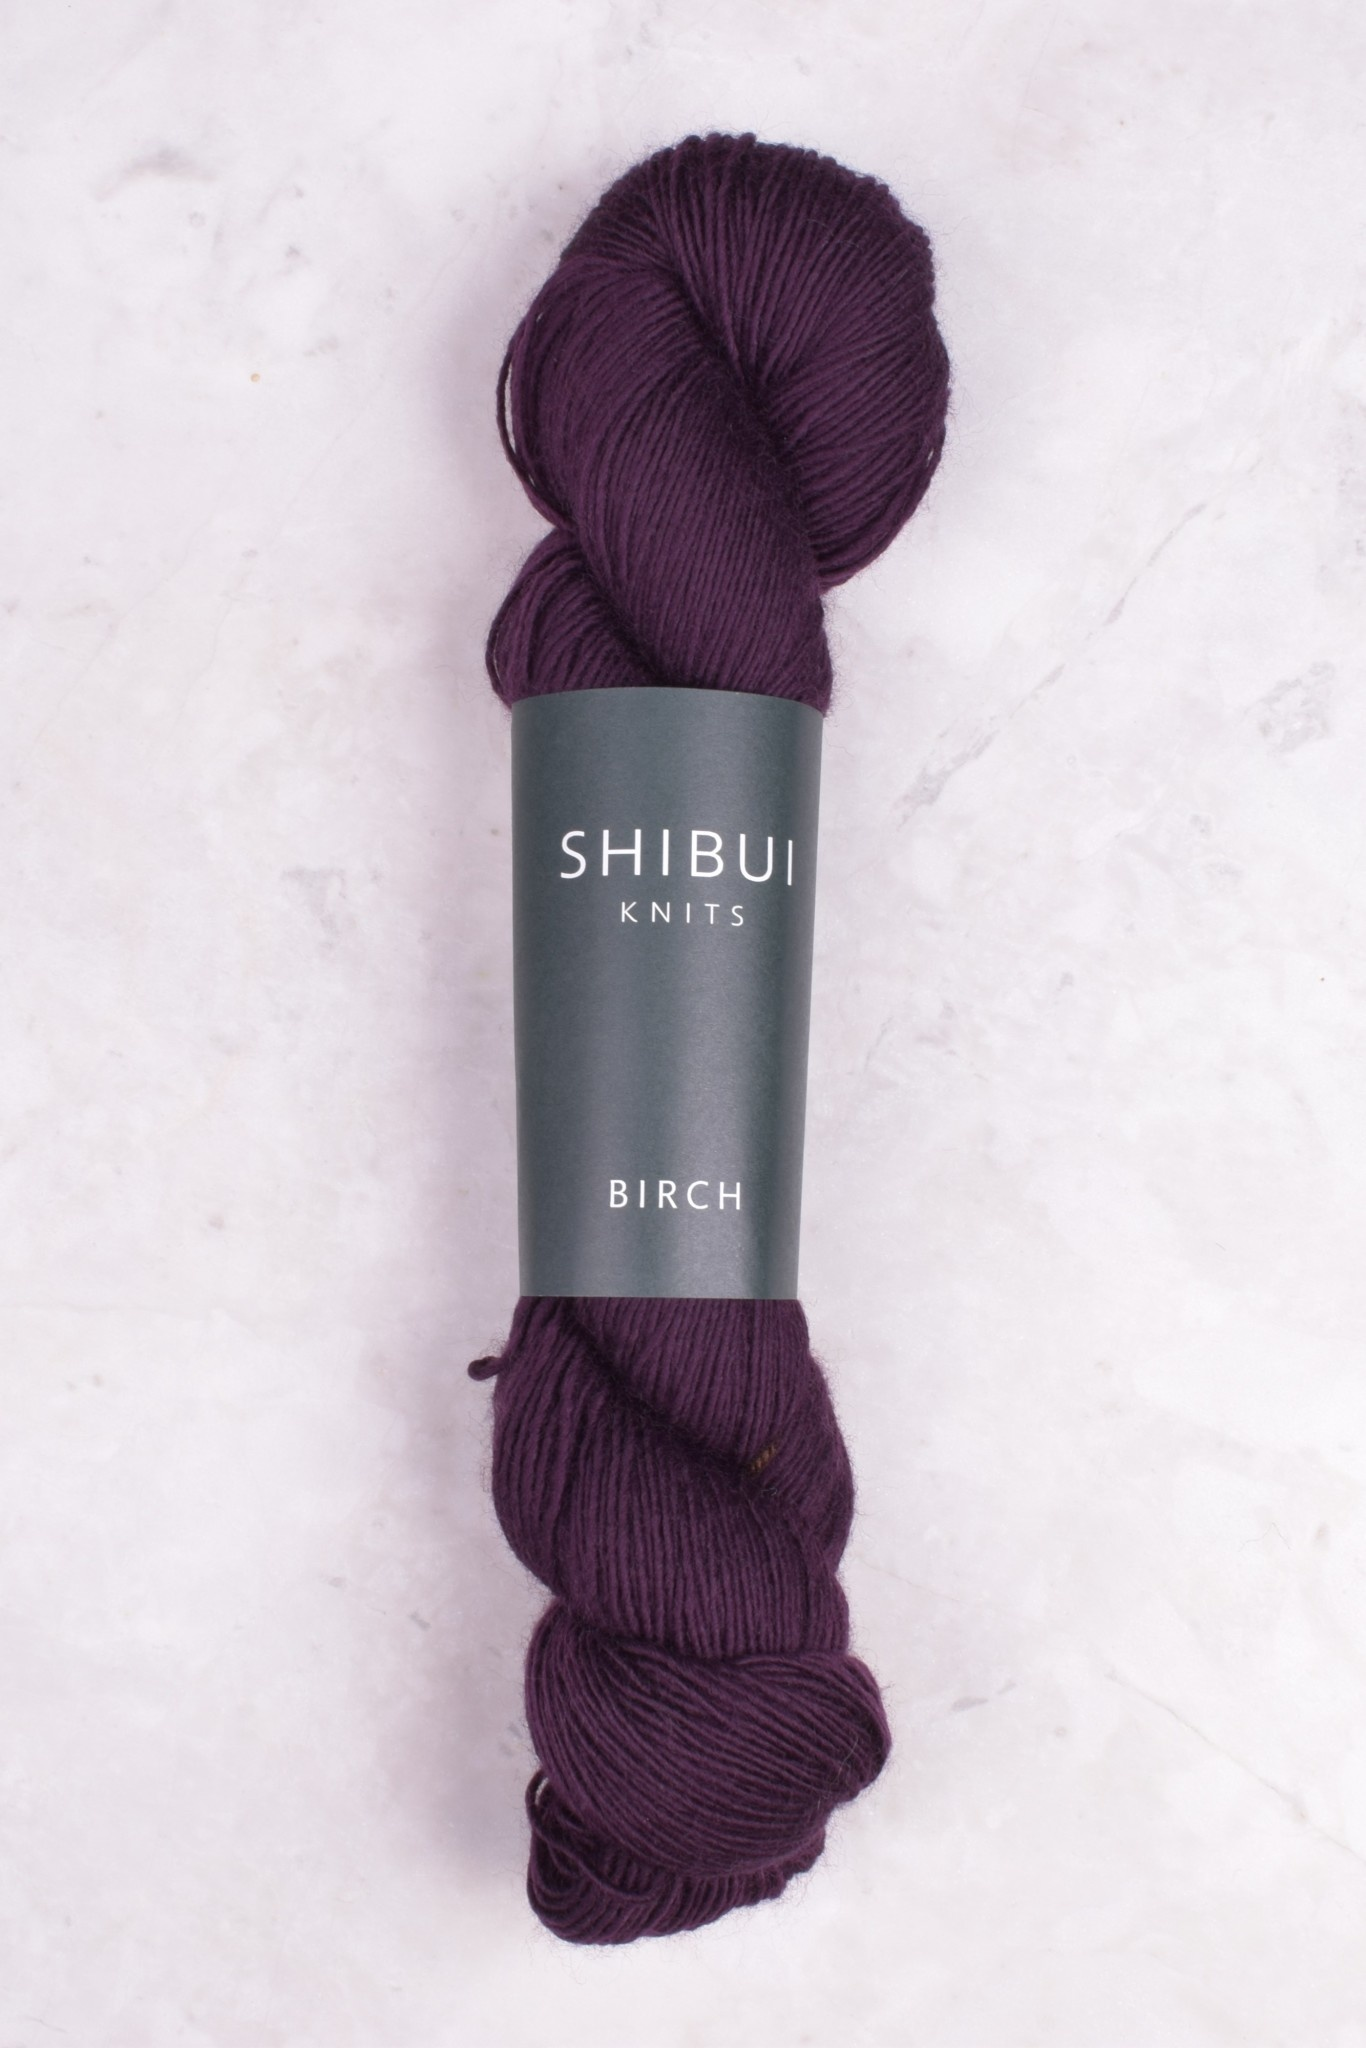 Image of Shibui Birch 2017 Velvet (Discontinued)